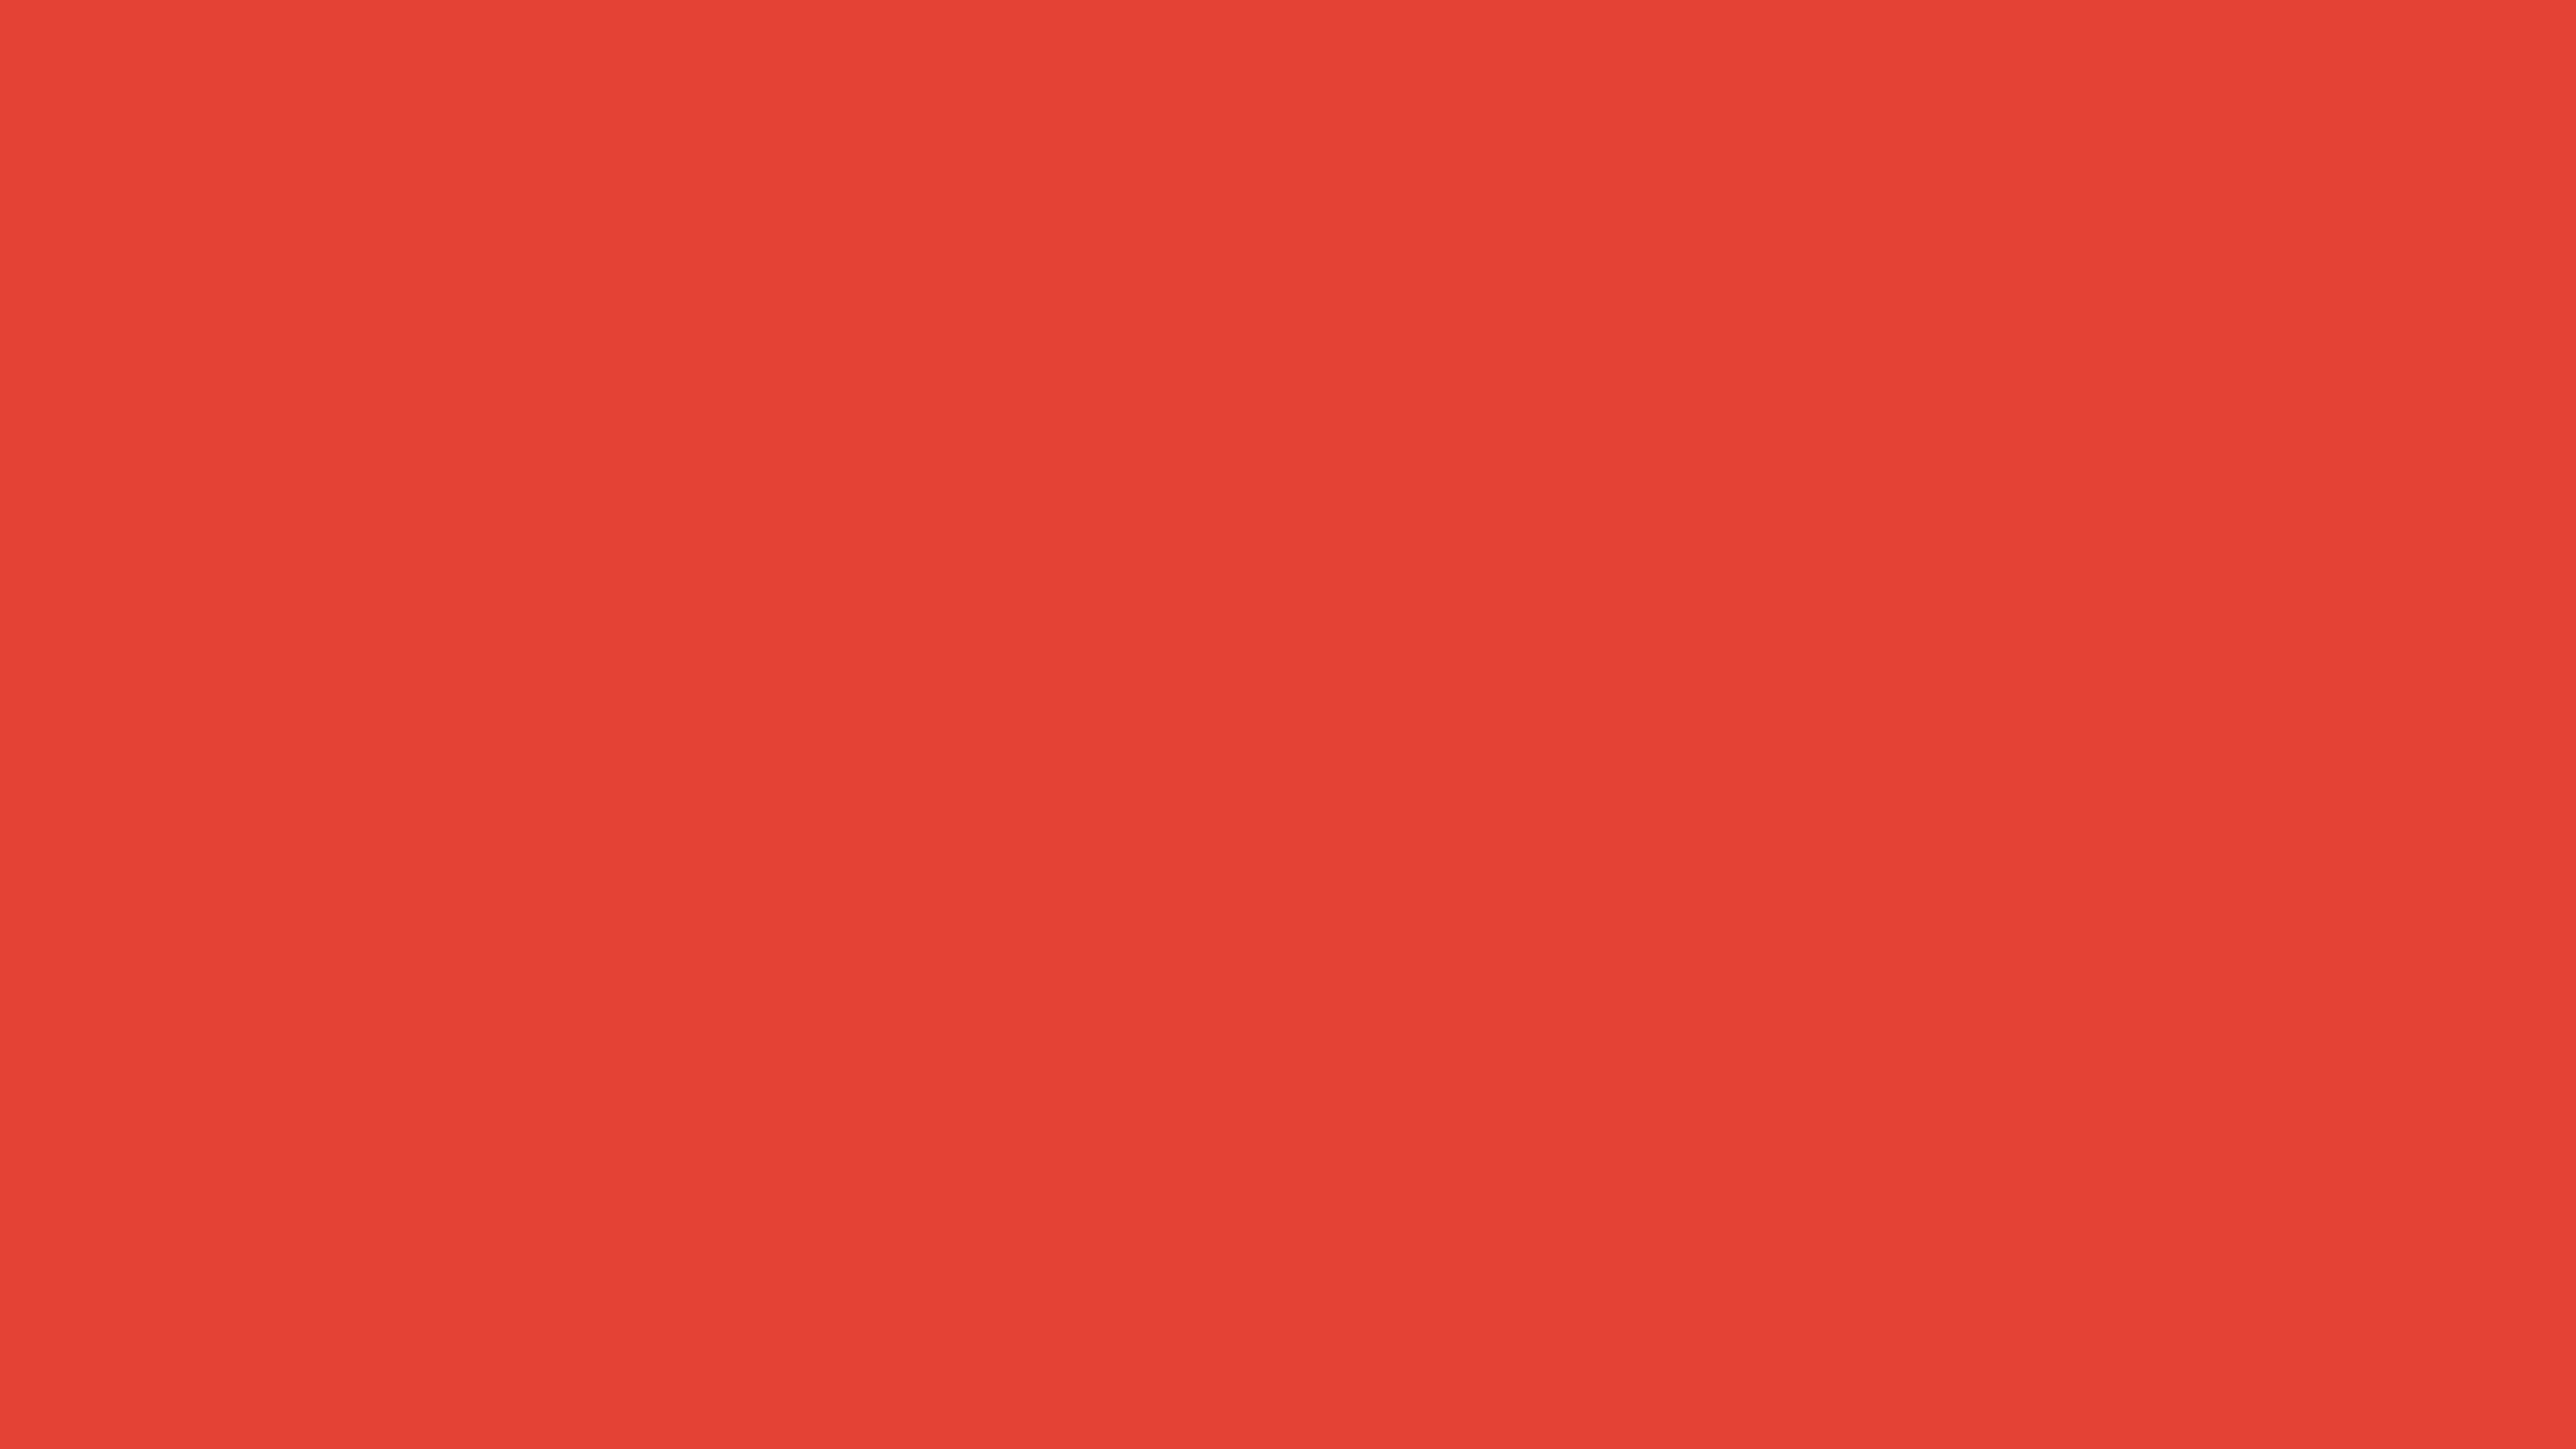 5120x2880 Vermilion Cinnabar Solid Color Background